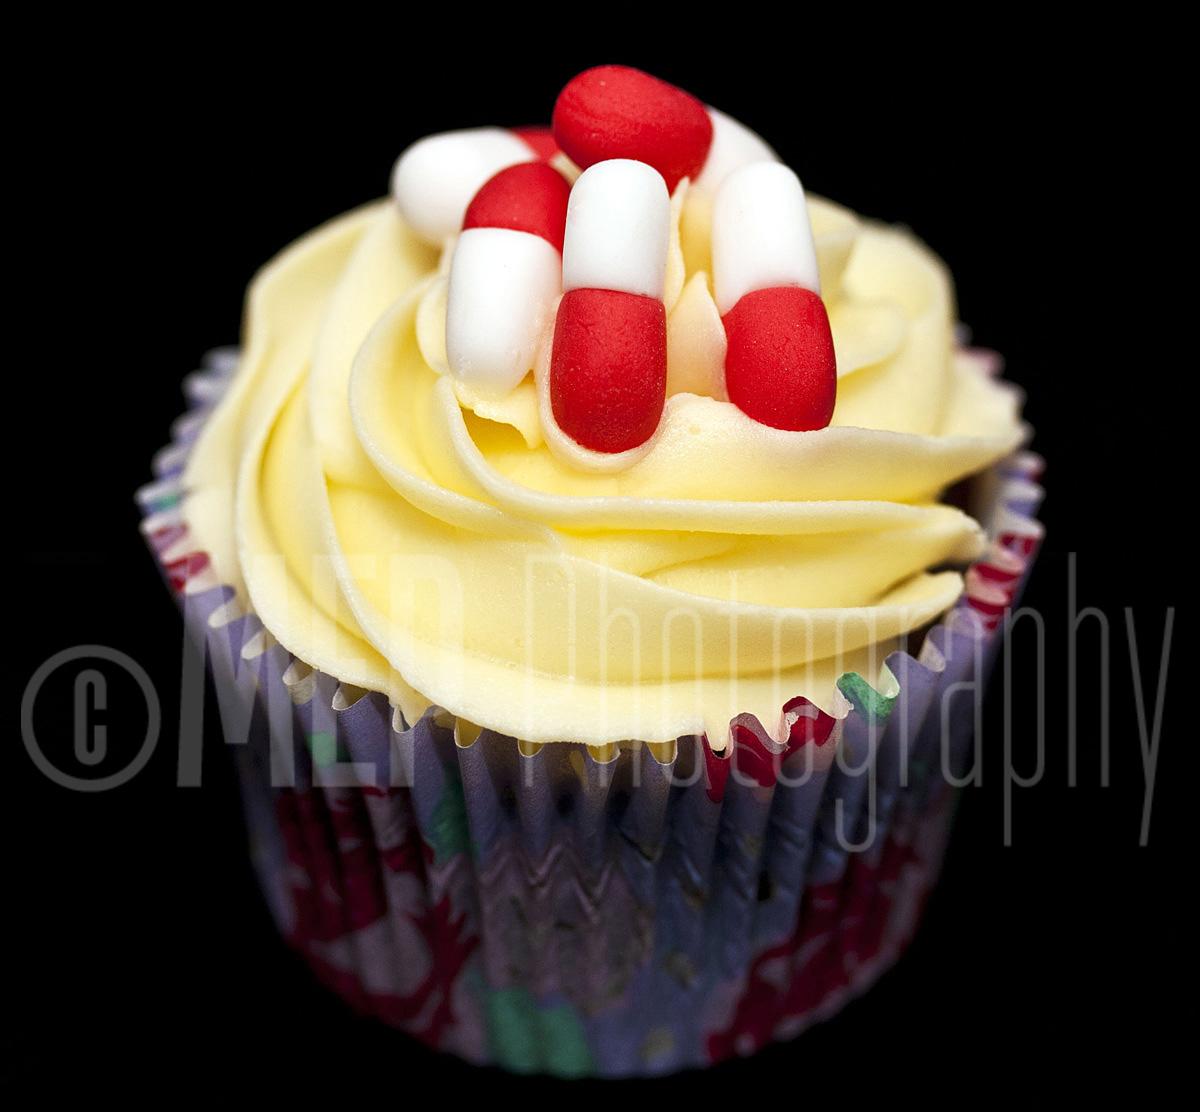 Jen's Cake Mix (3).jpg